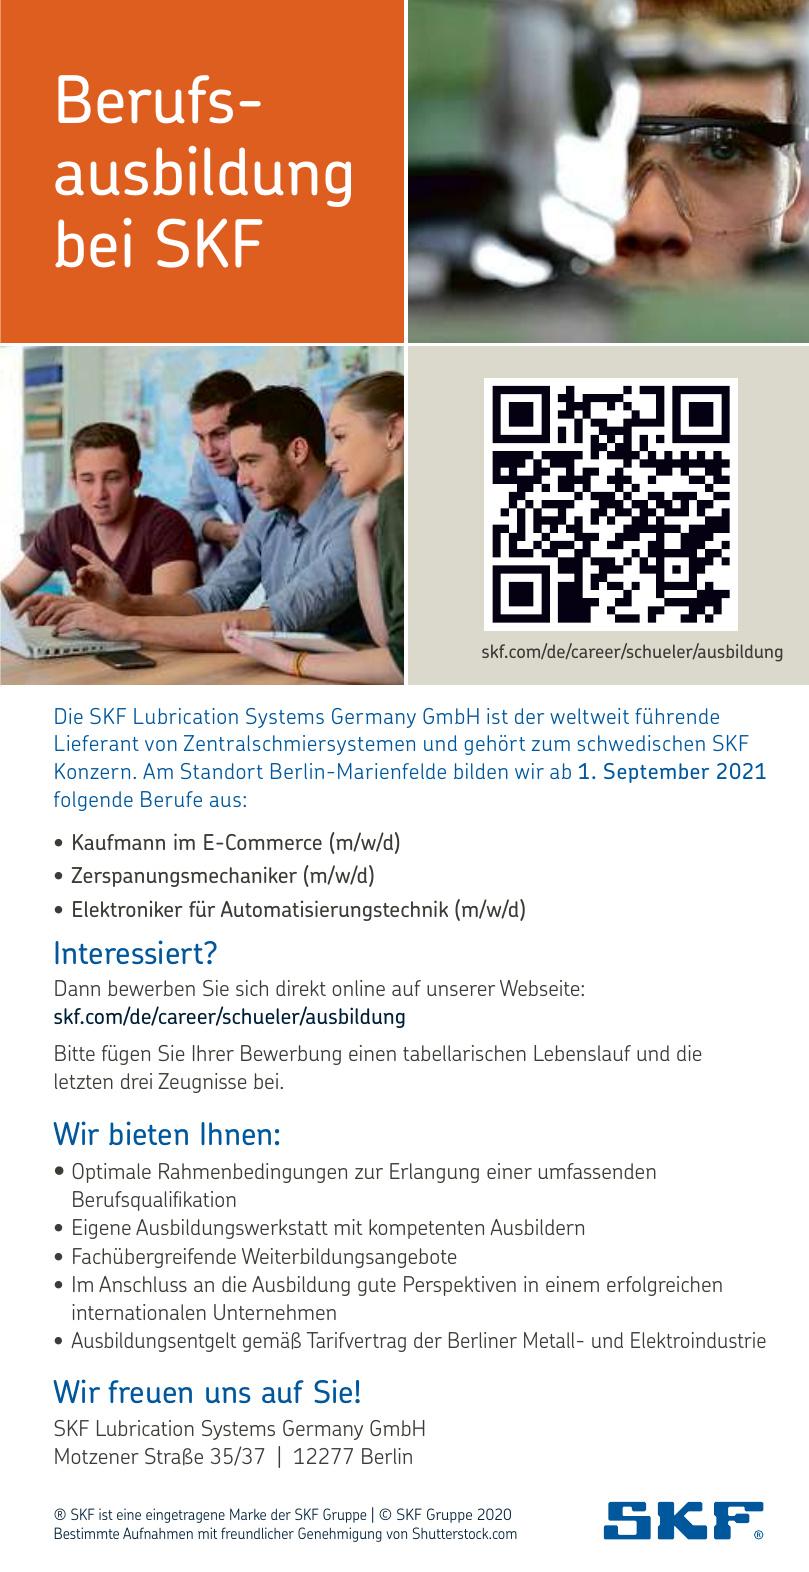 SKF Lubrication Systems Germany GmbH